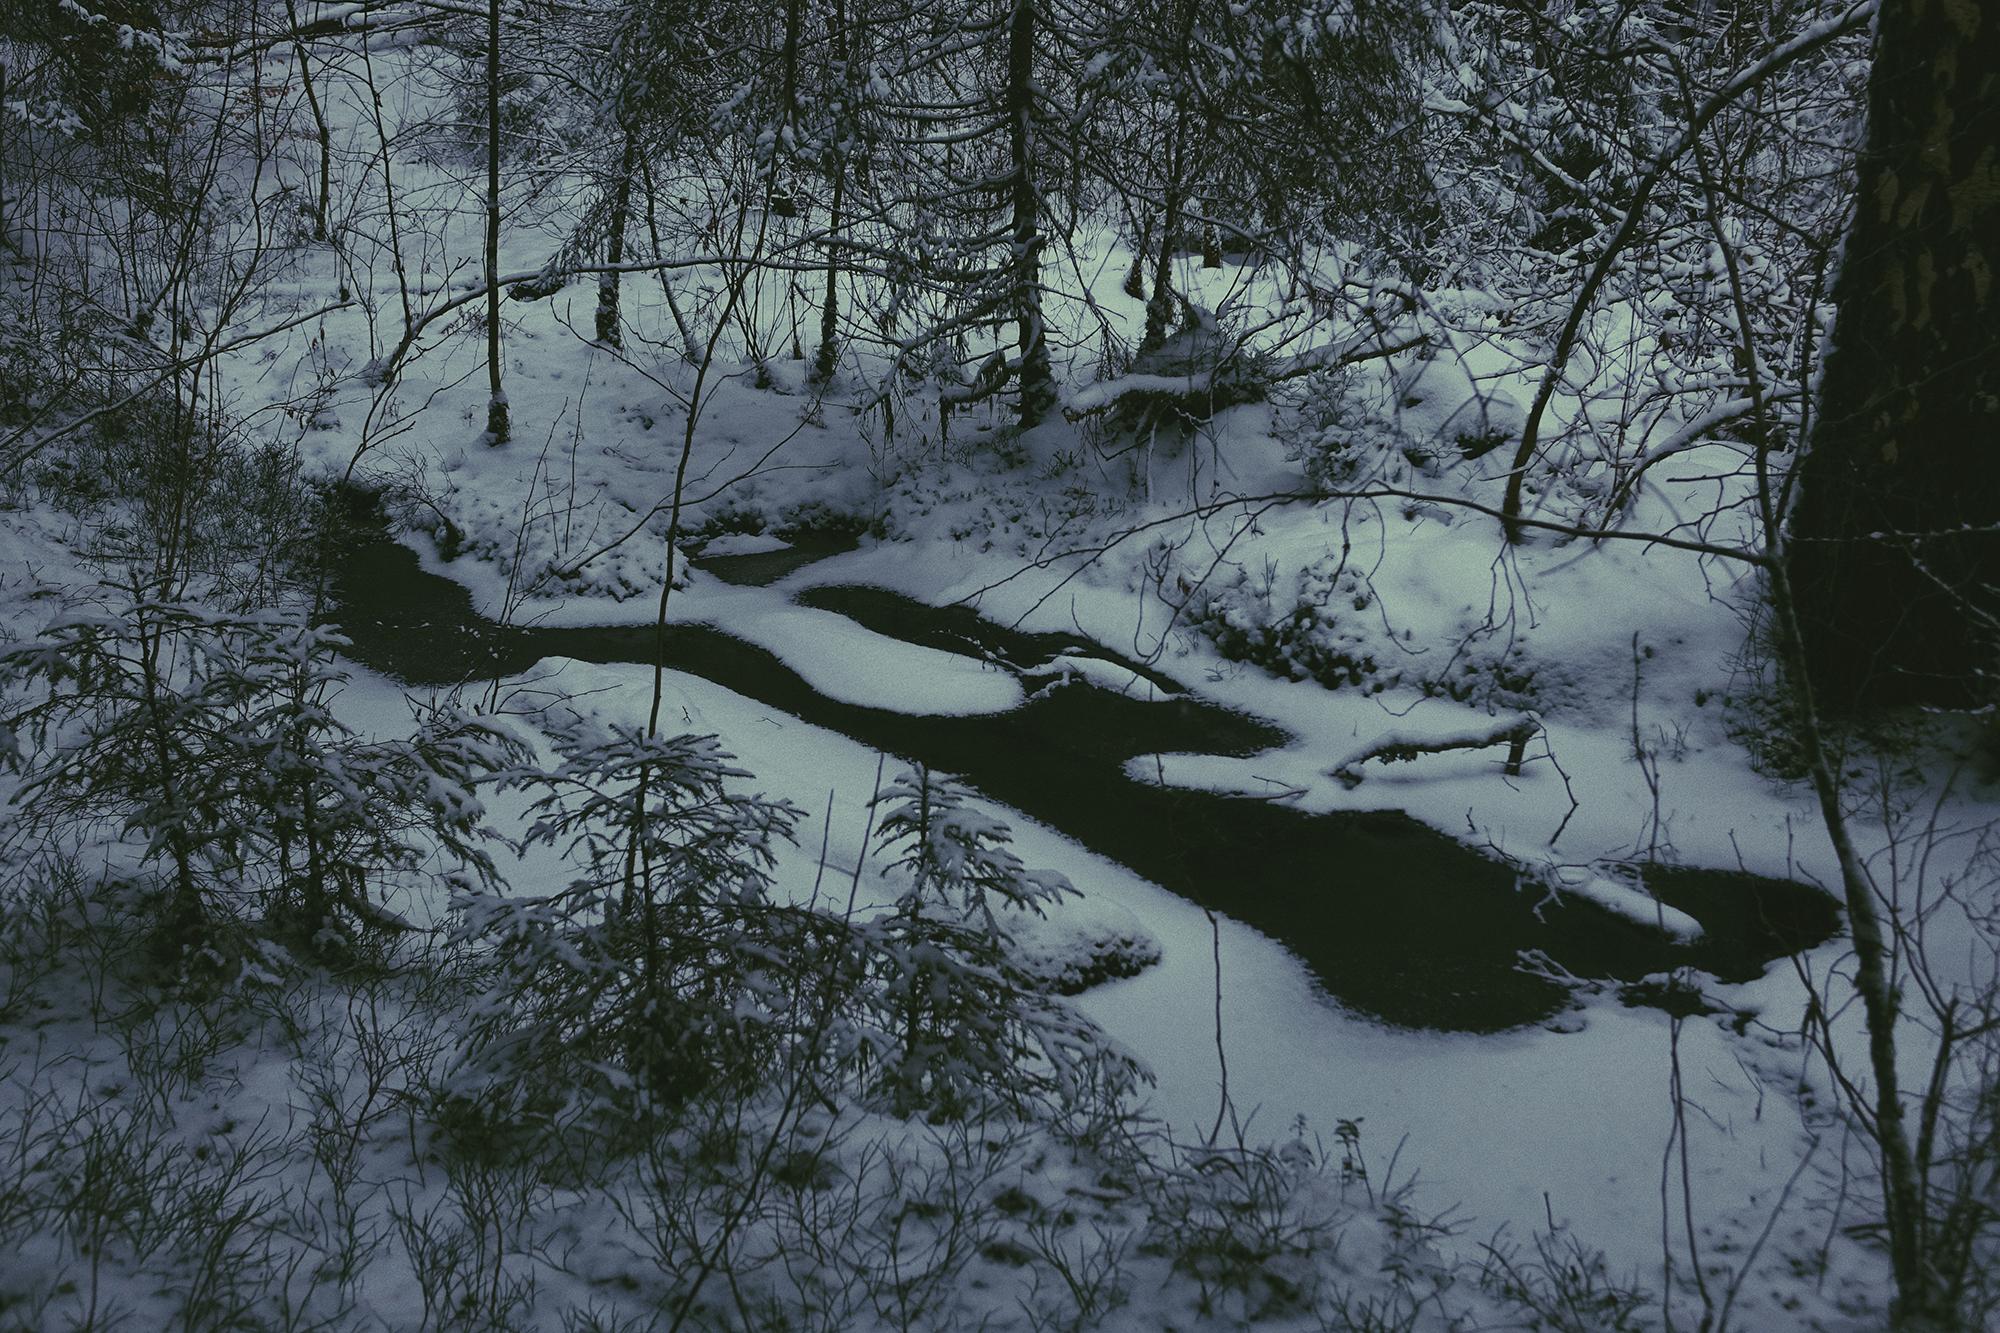 February 21st Series, Margarita Sheremet Photography